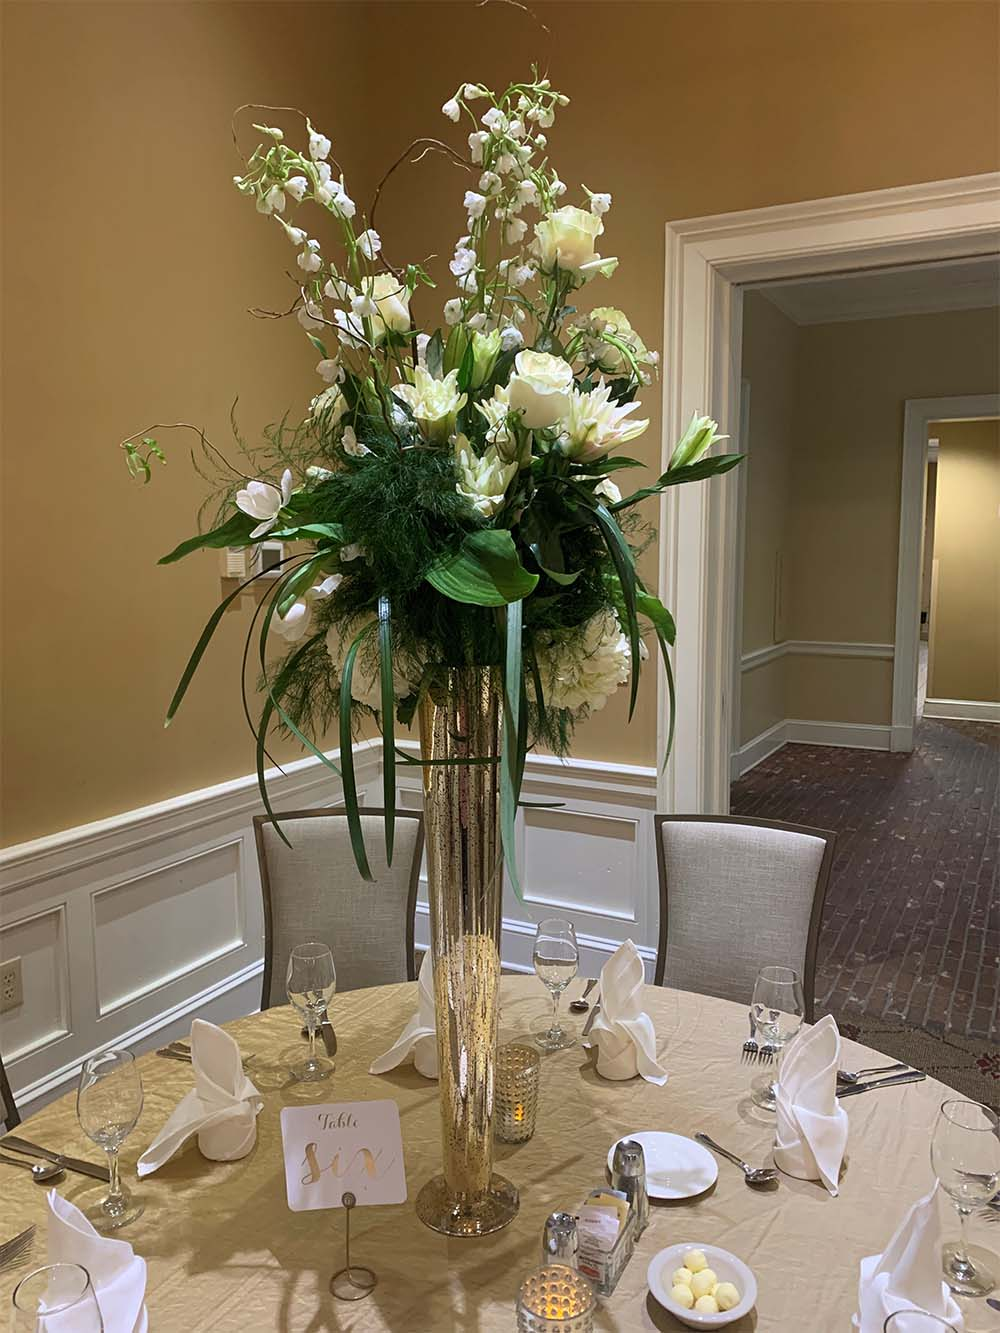 Weddings - The University Florist